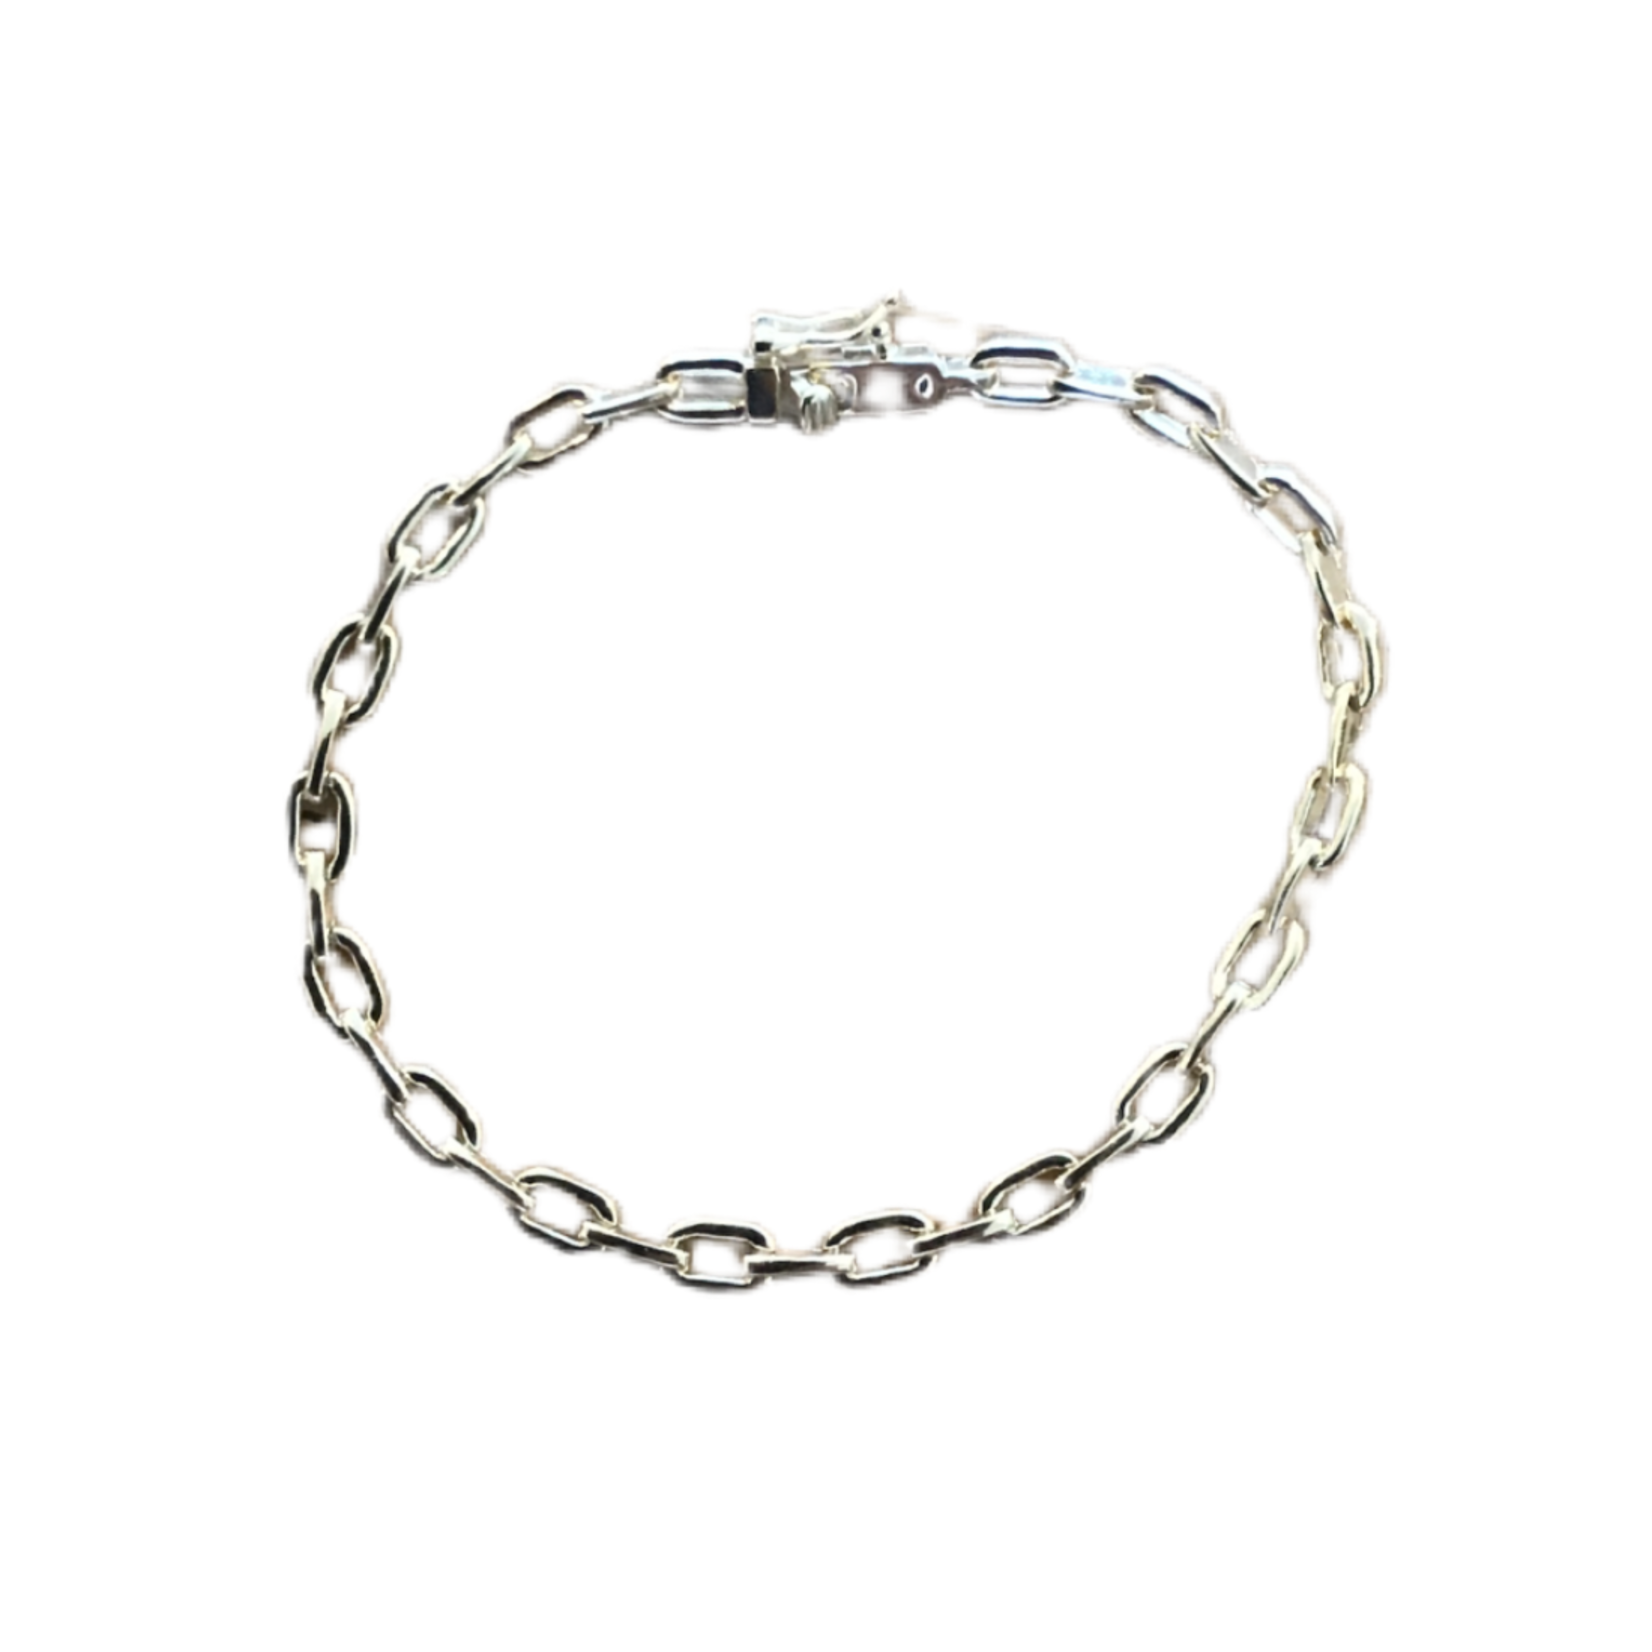 Wyld Blue Gold Link Chain Bracelet